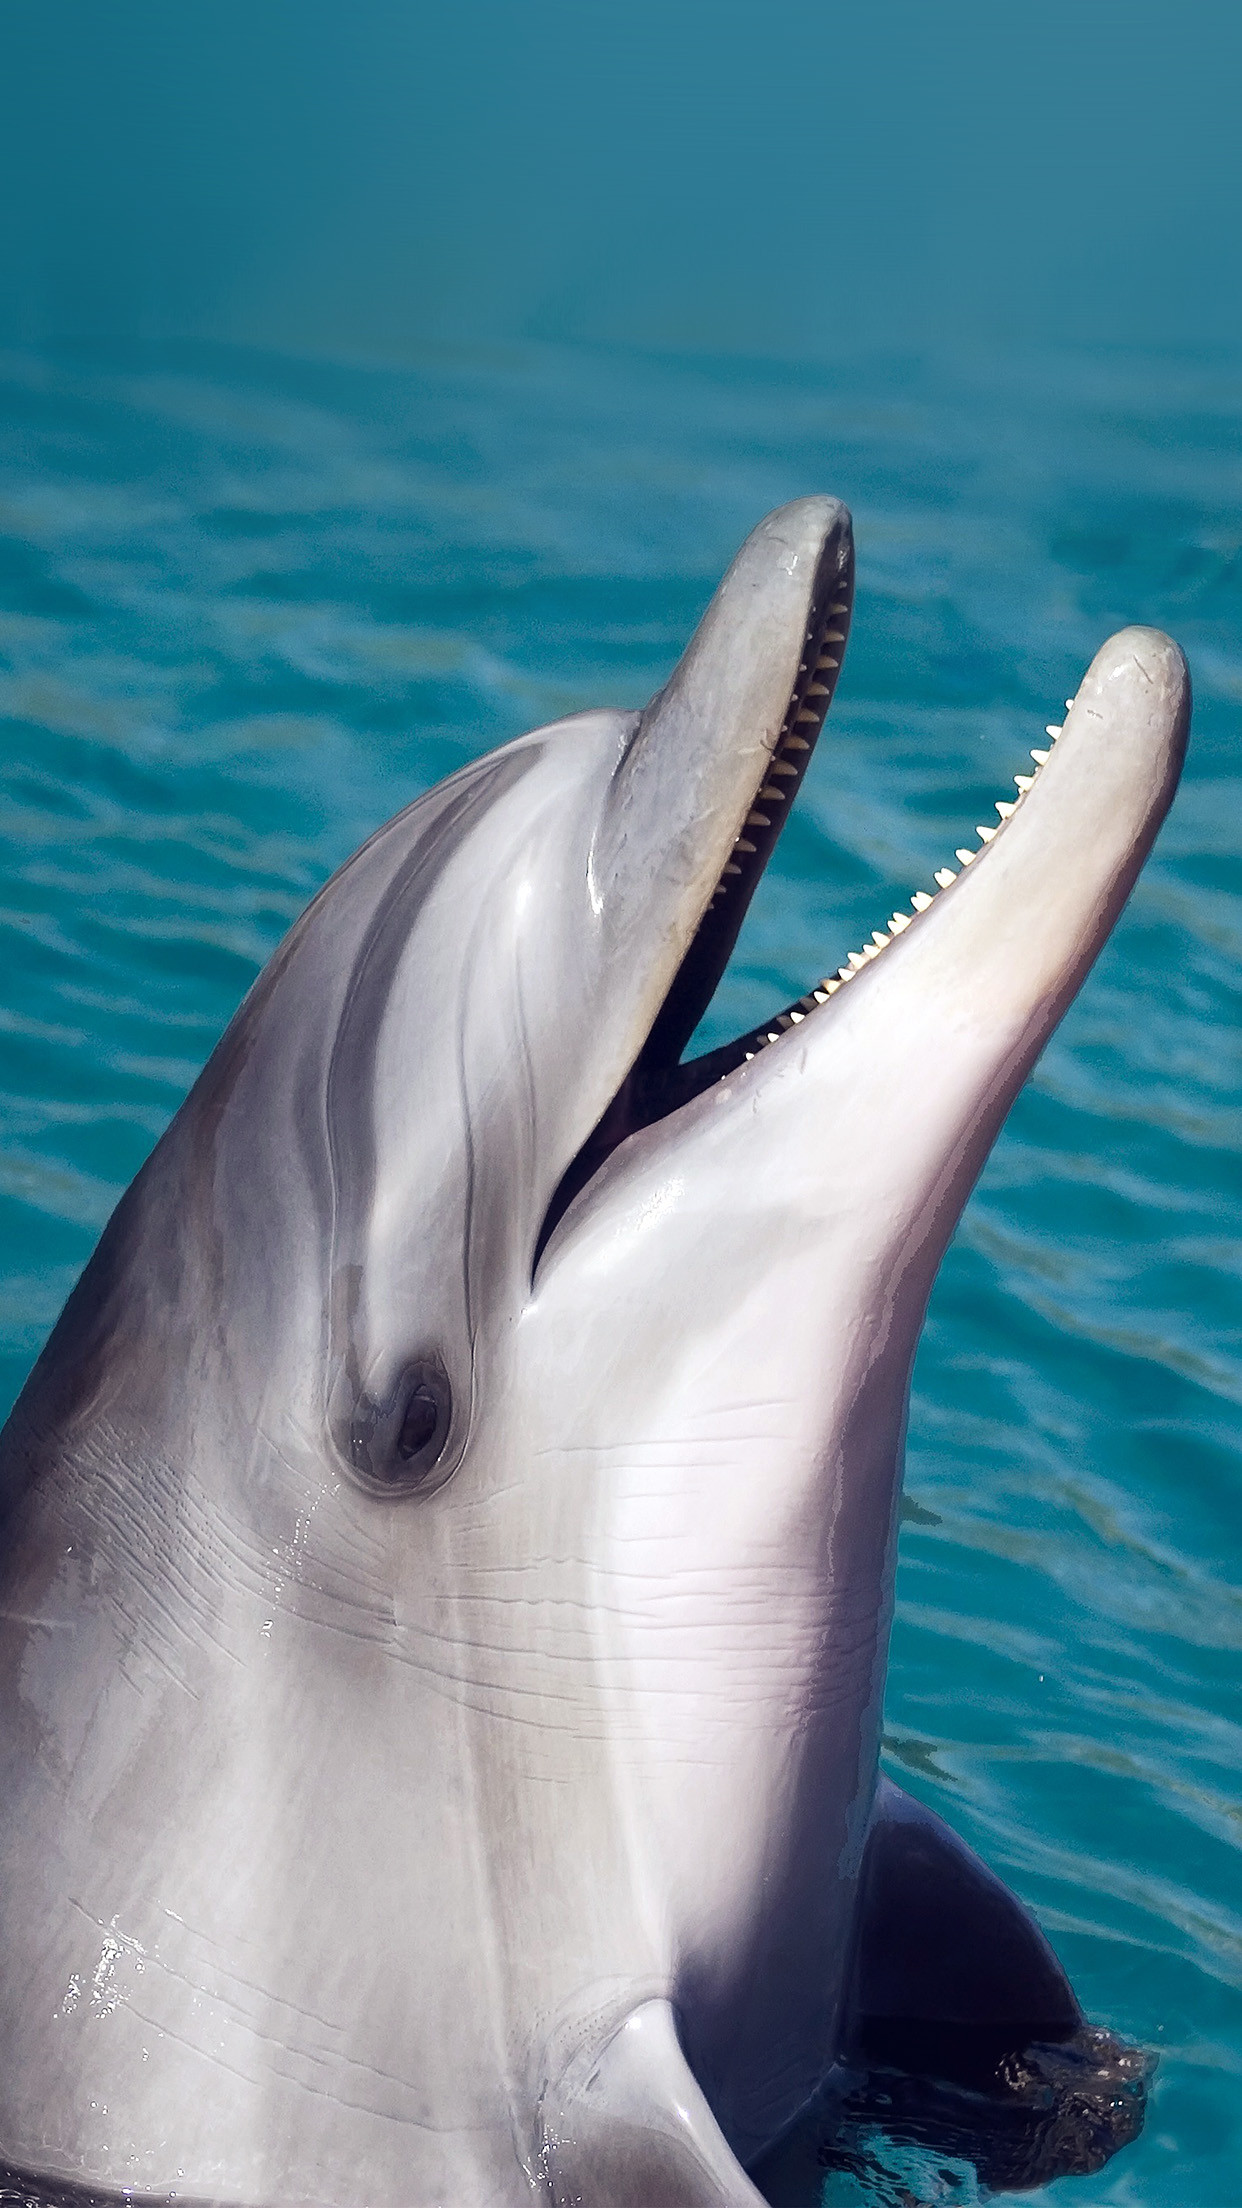 Free Hd Cute Baby Wallpaper Cute Dolphin Wallpaper 183 ① Wallpapertag